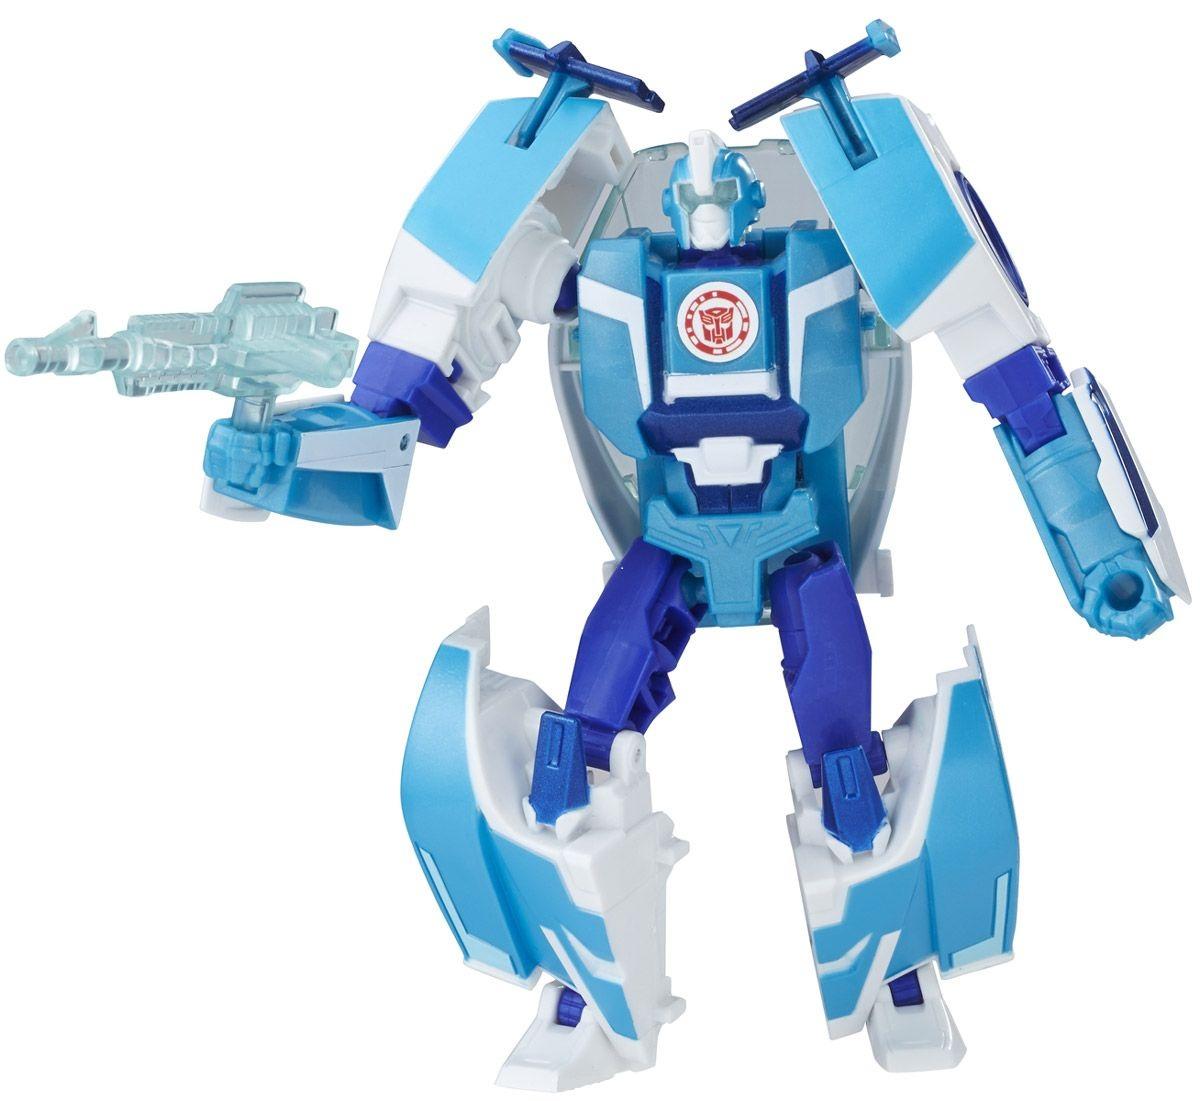 Трансформер из серии Combiner Force – BlurrИгрушки трансформеры<br>Трансформер из серии Combiner Force – Blurr<br>